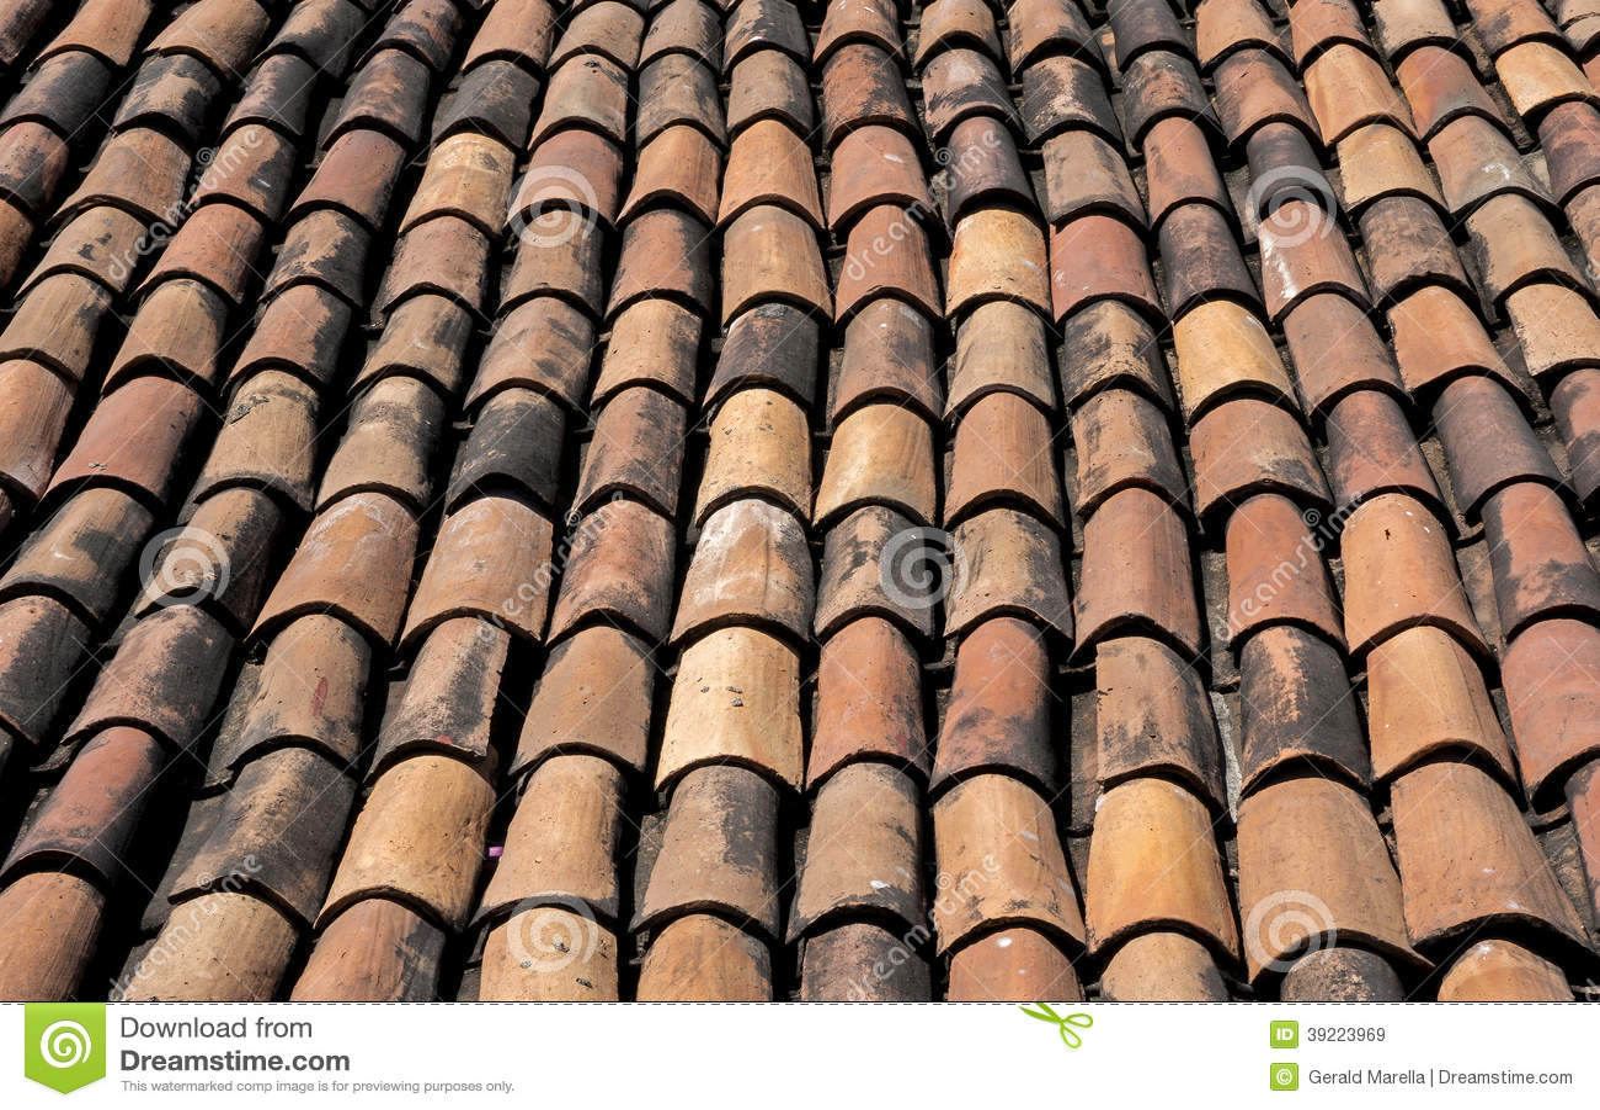 Terra Cotta Roofing Tiles Stock Photo Image 39223969